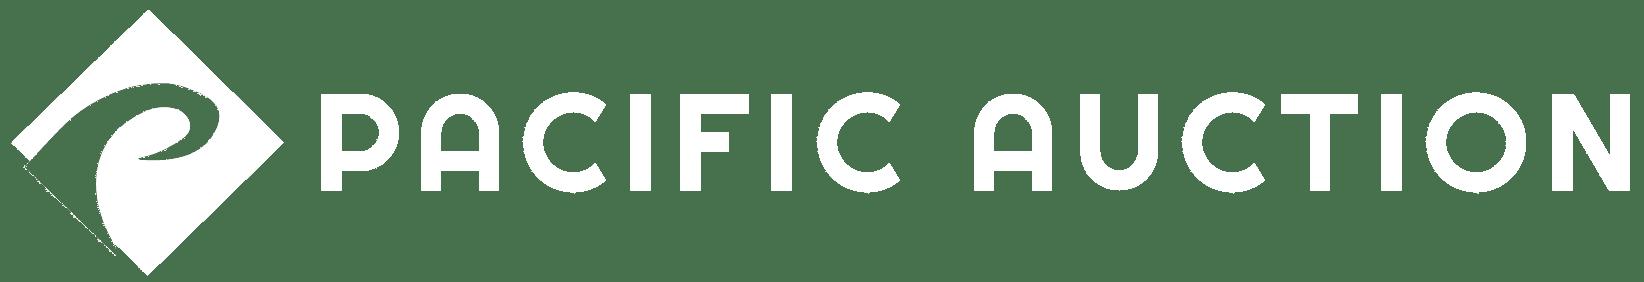 Pacific Auction Logo